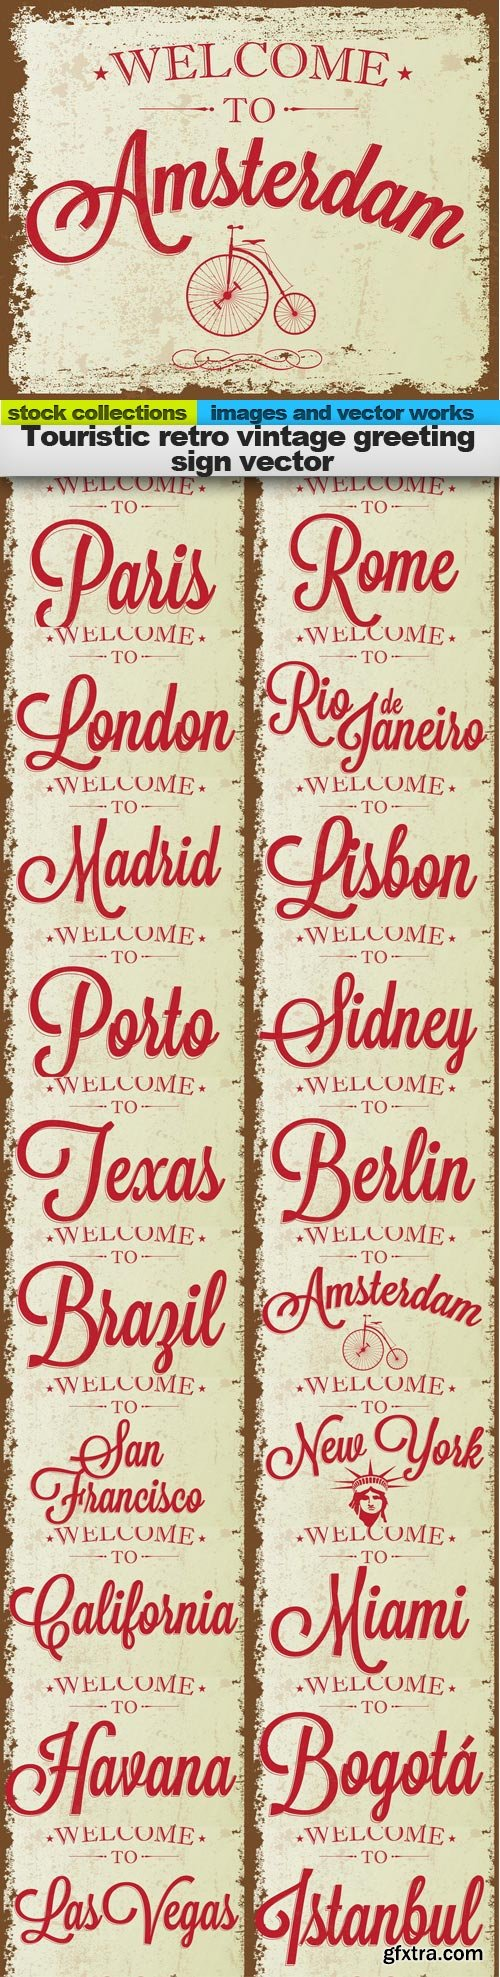 Touristic retro vintage greeting sign vector, 20 x EPS